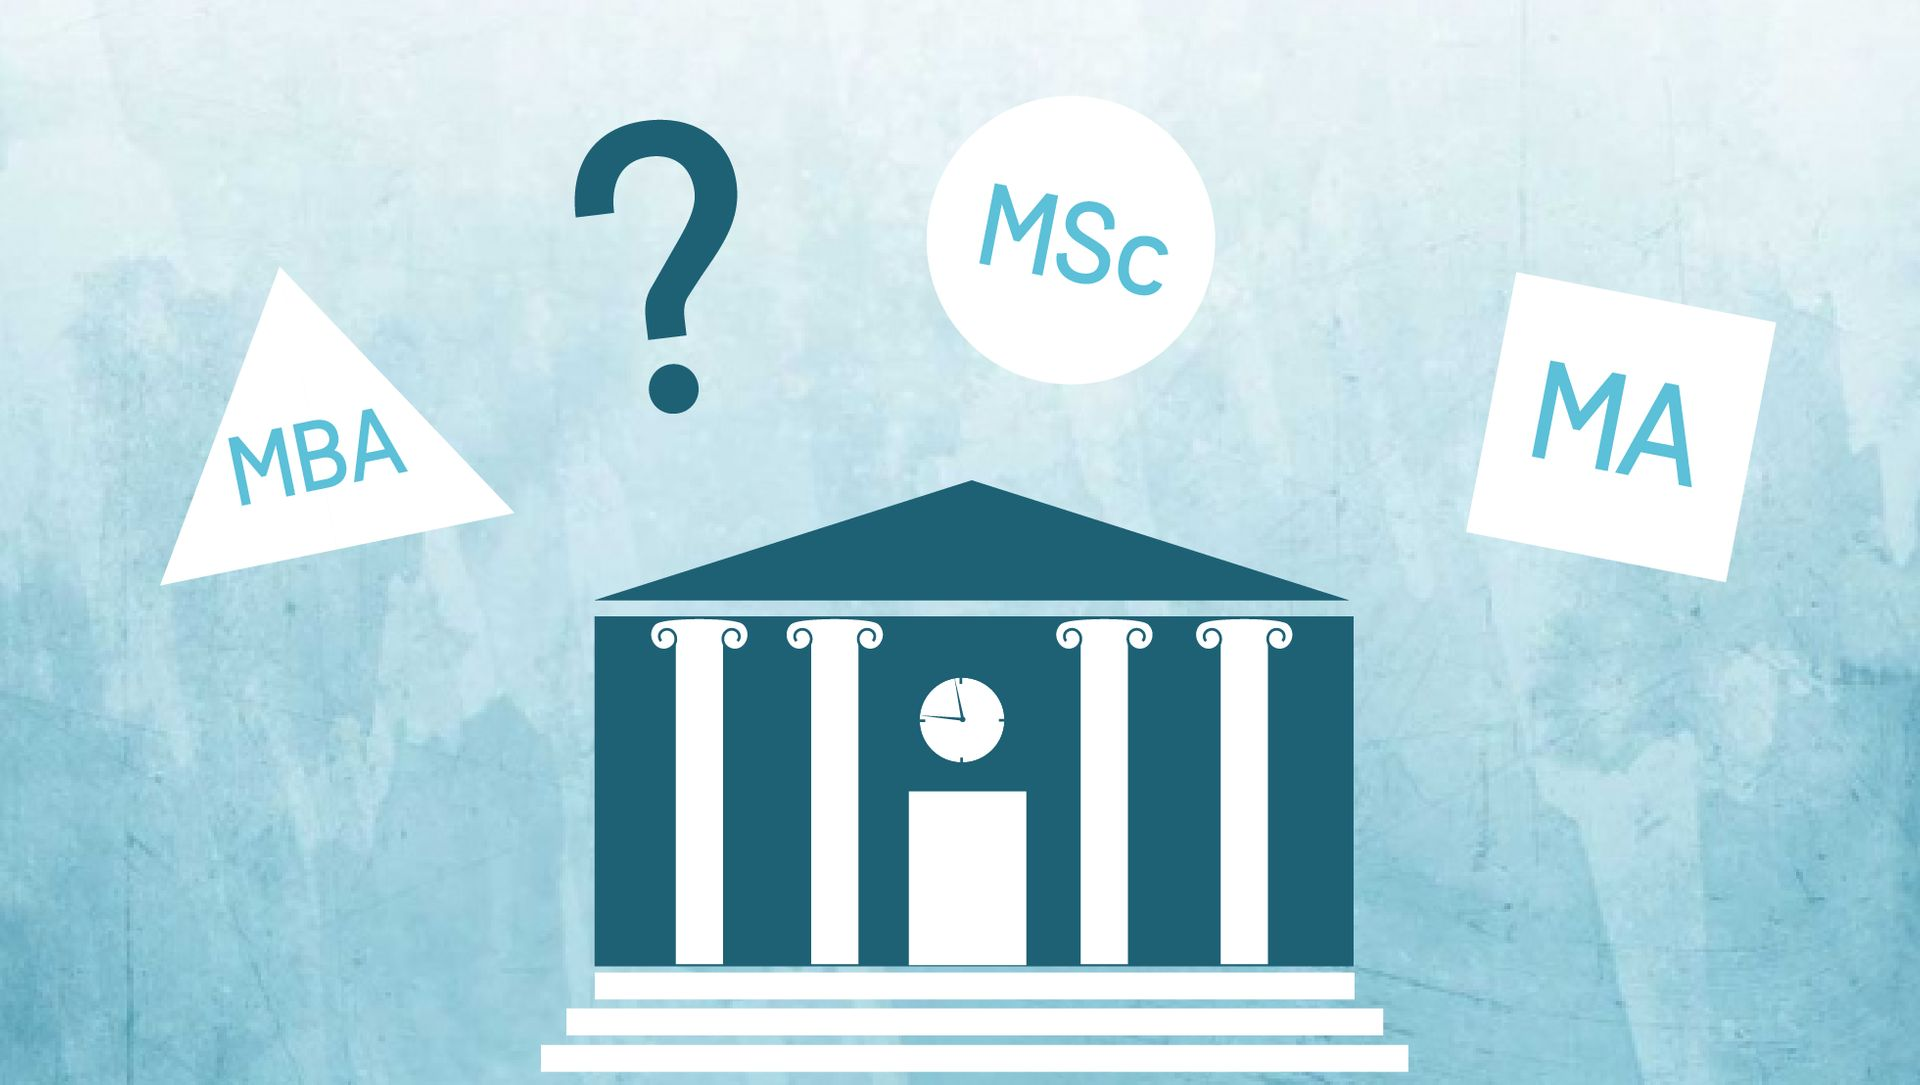 Illustration. Caption reads 'MBA, MSc, MA?'